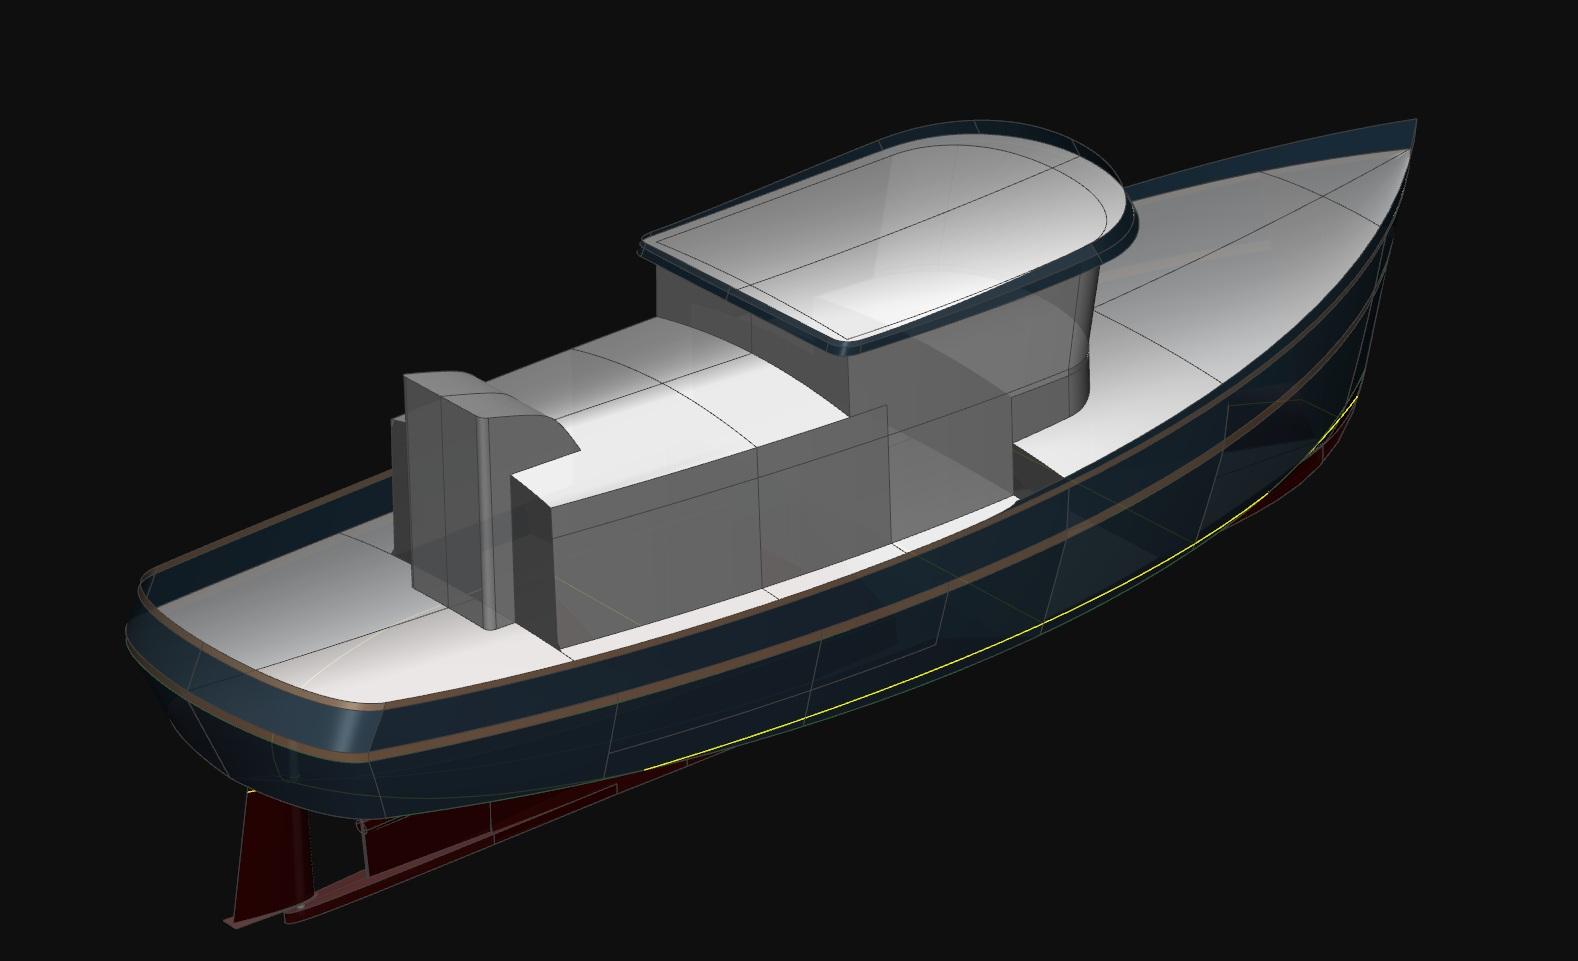 40' Ocean Trawler Exterior Profile | 45' Ocean Trawler Perspective Aft ...